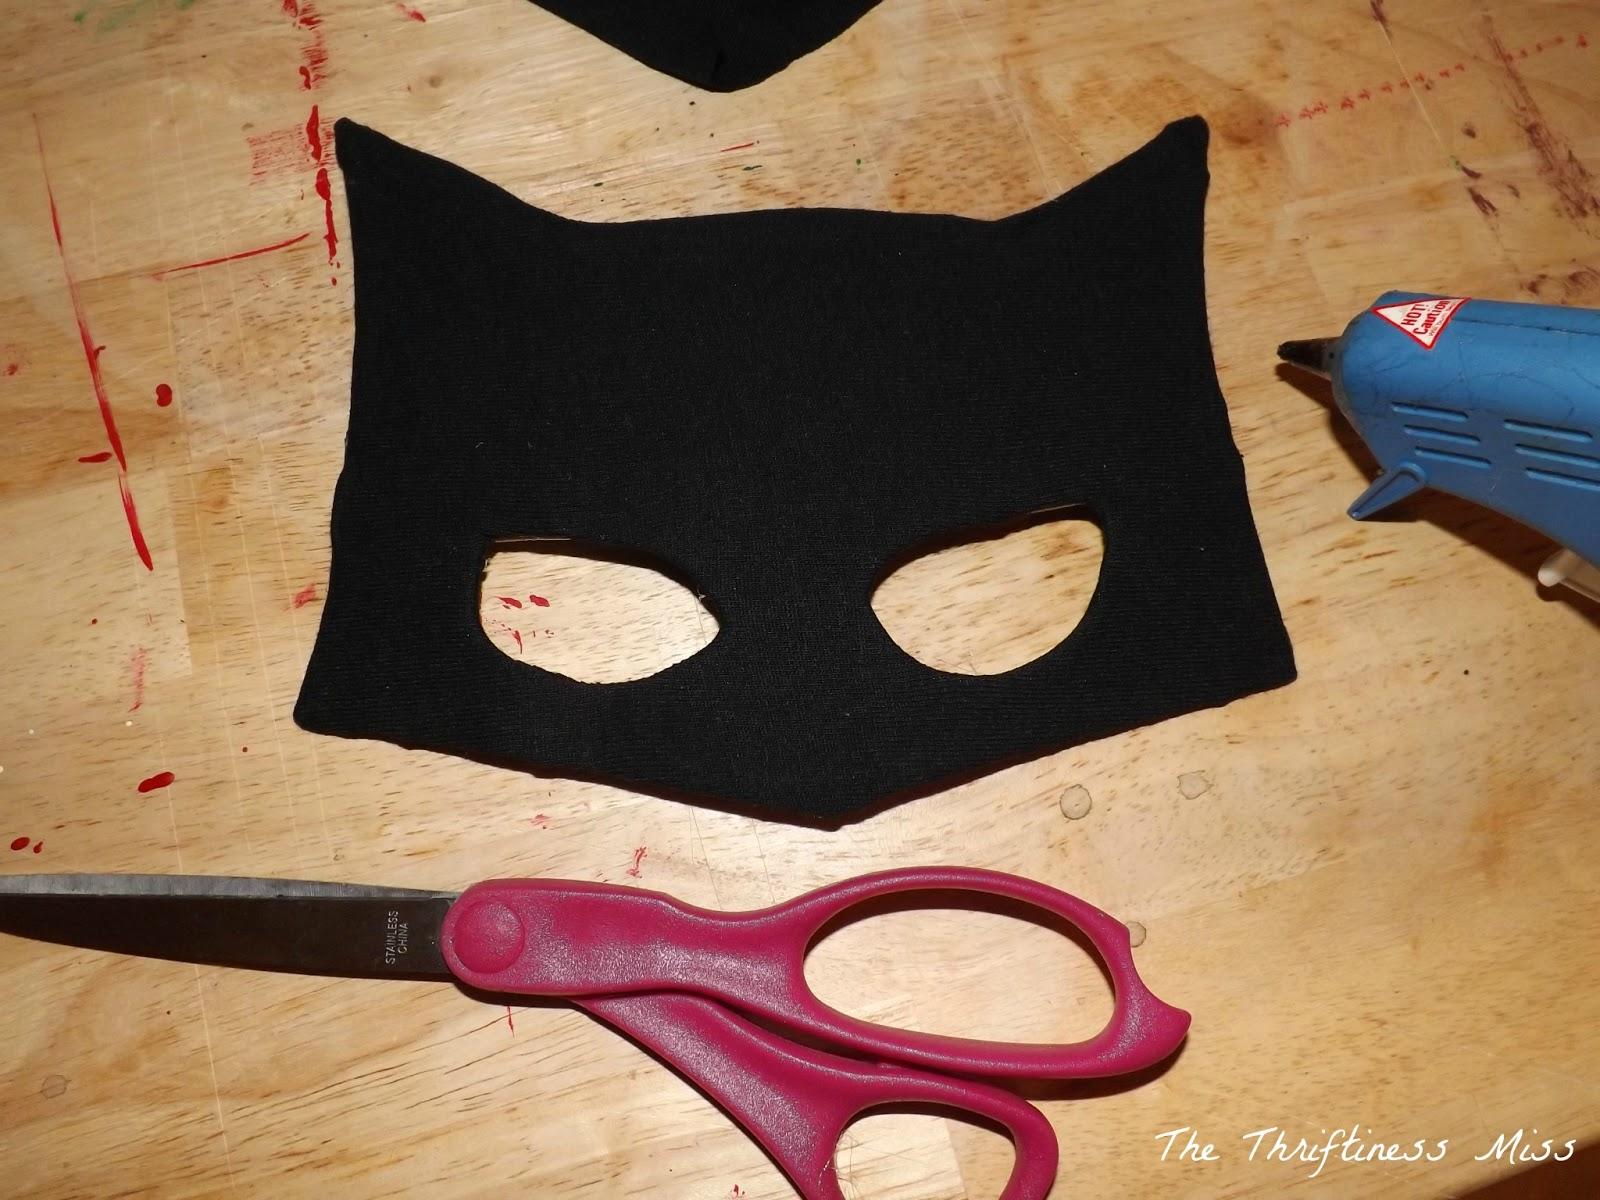 Batman Mask Template For Kids Tattoo Updated 2016 - Kedai Asongan